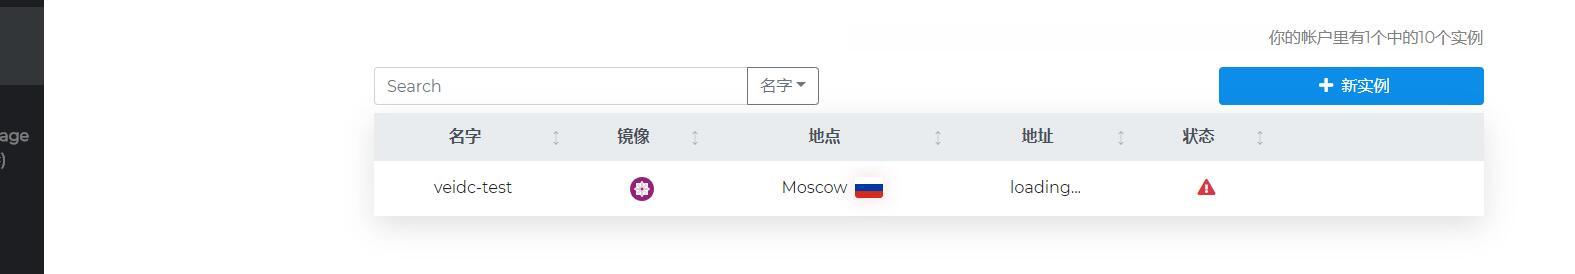 HostVDS:月付5.49元,俄罗斯OpenStack云服务器,1G内存/1核/10gNVMe,不限流量 附简单测评插图1